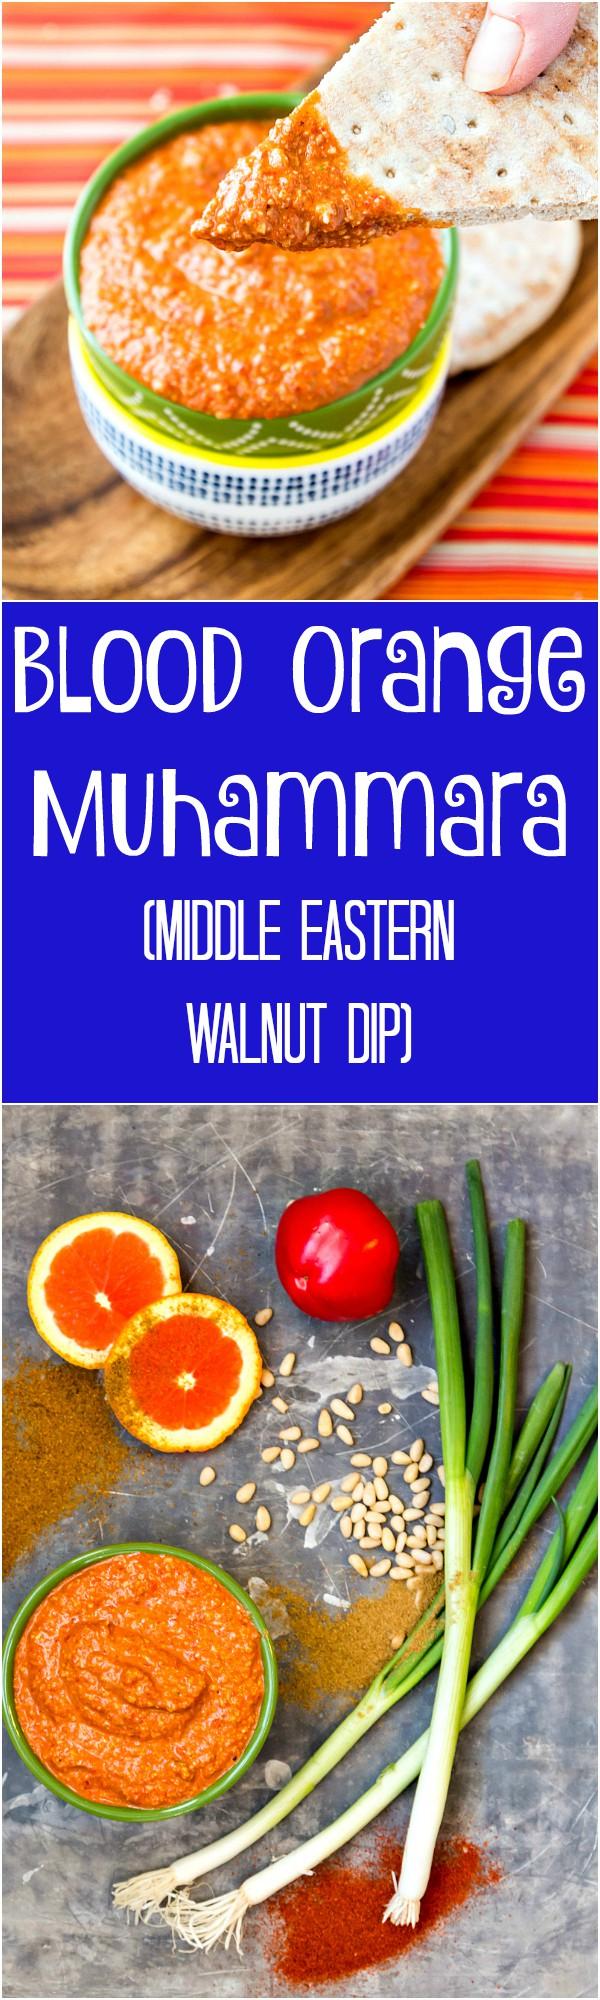 2 images of blood orange muhammara stitched together in a long collage. text reads blood orange muhammara (middle eastern walnut dip)